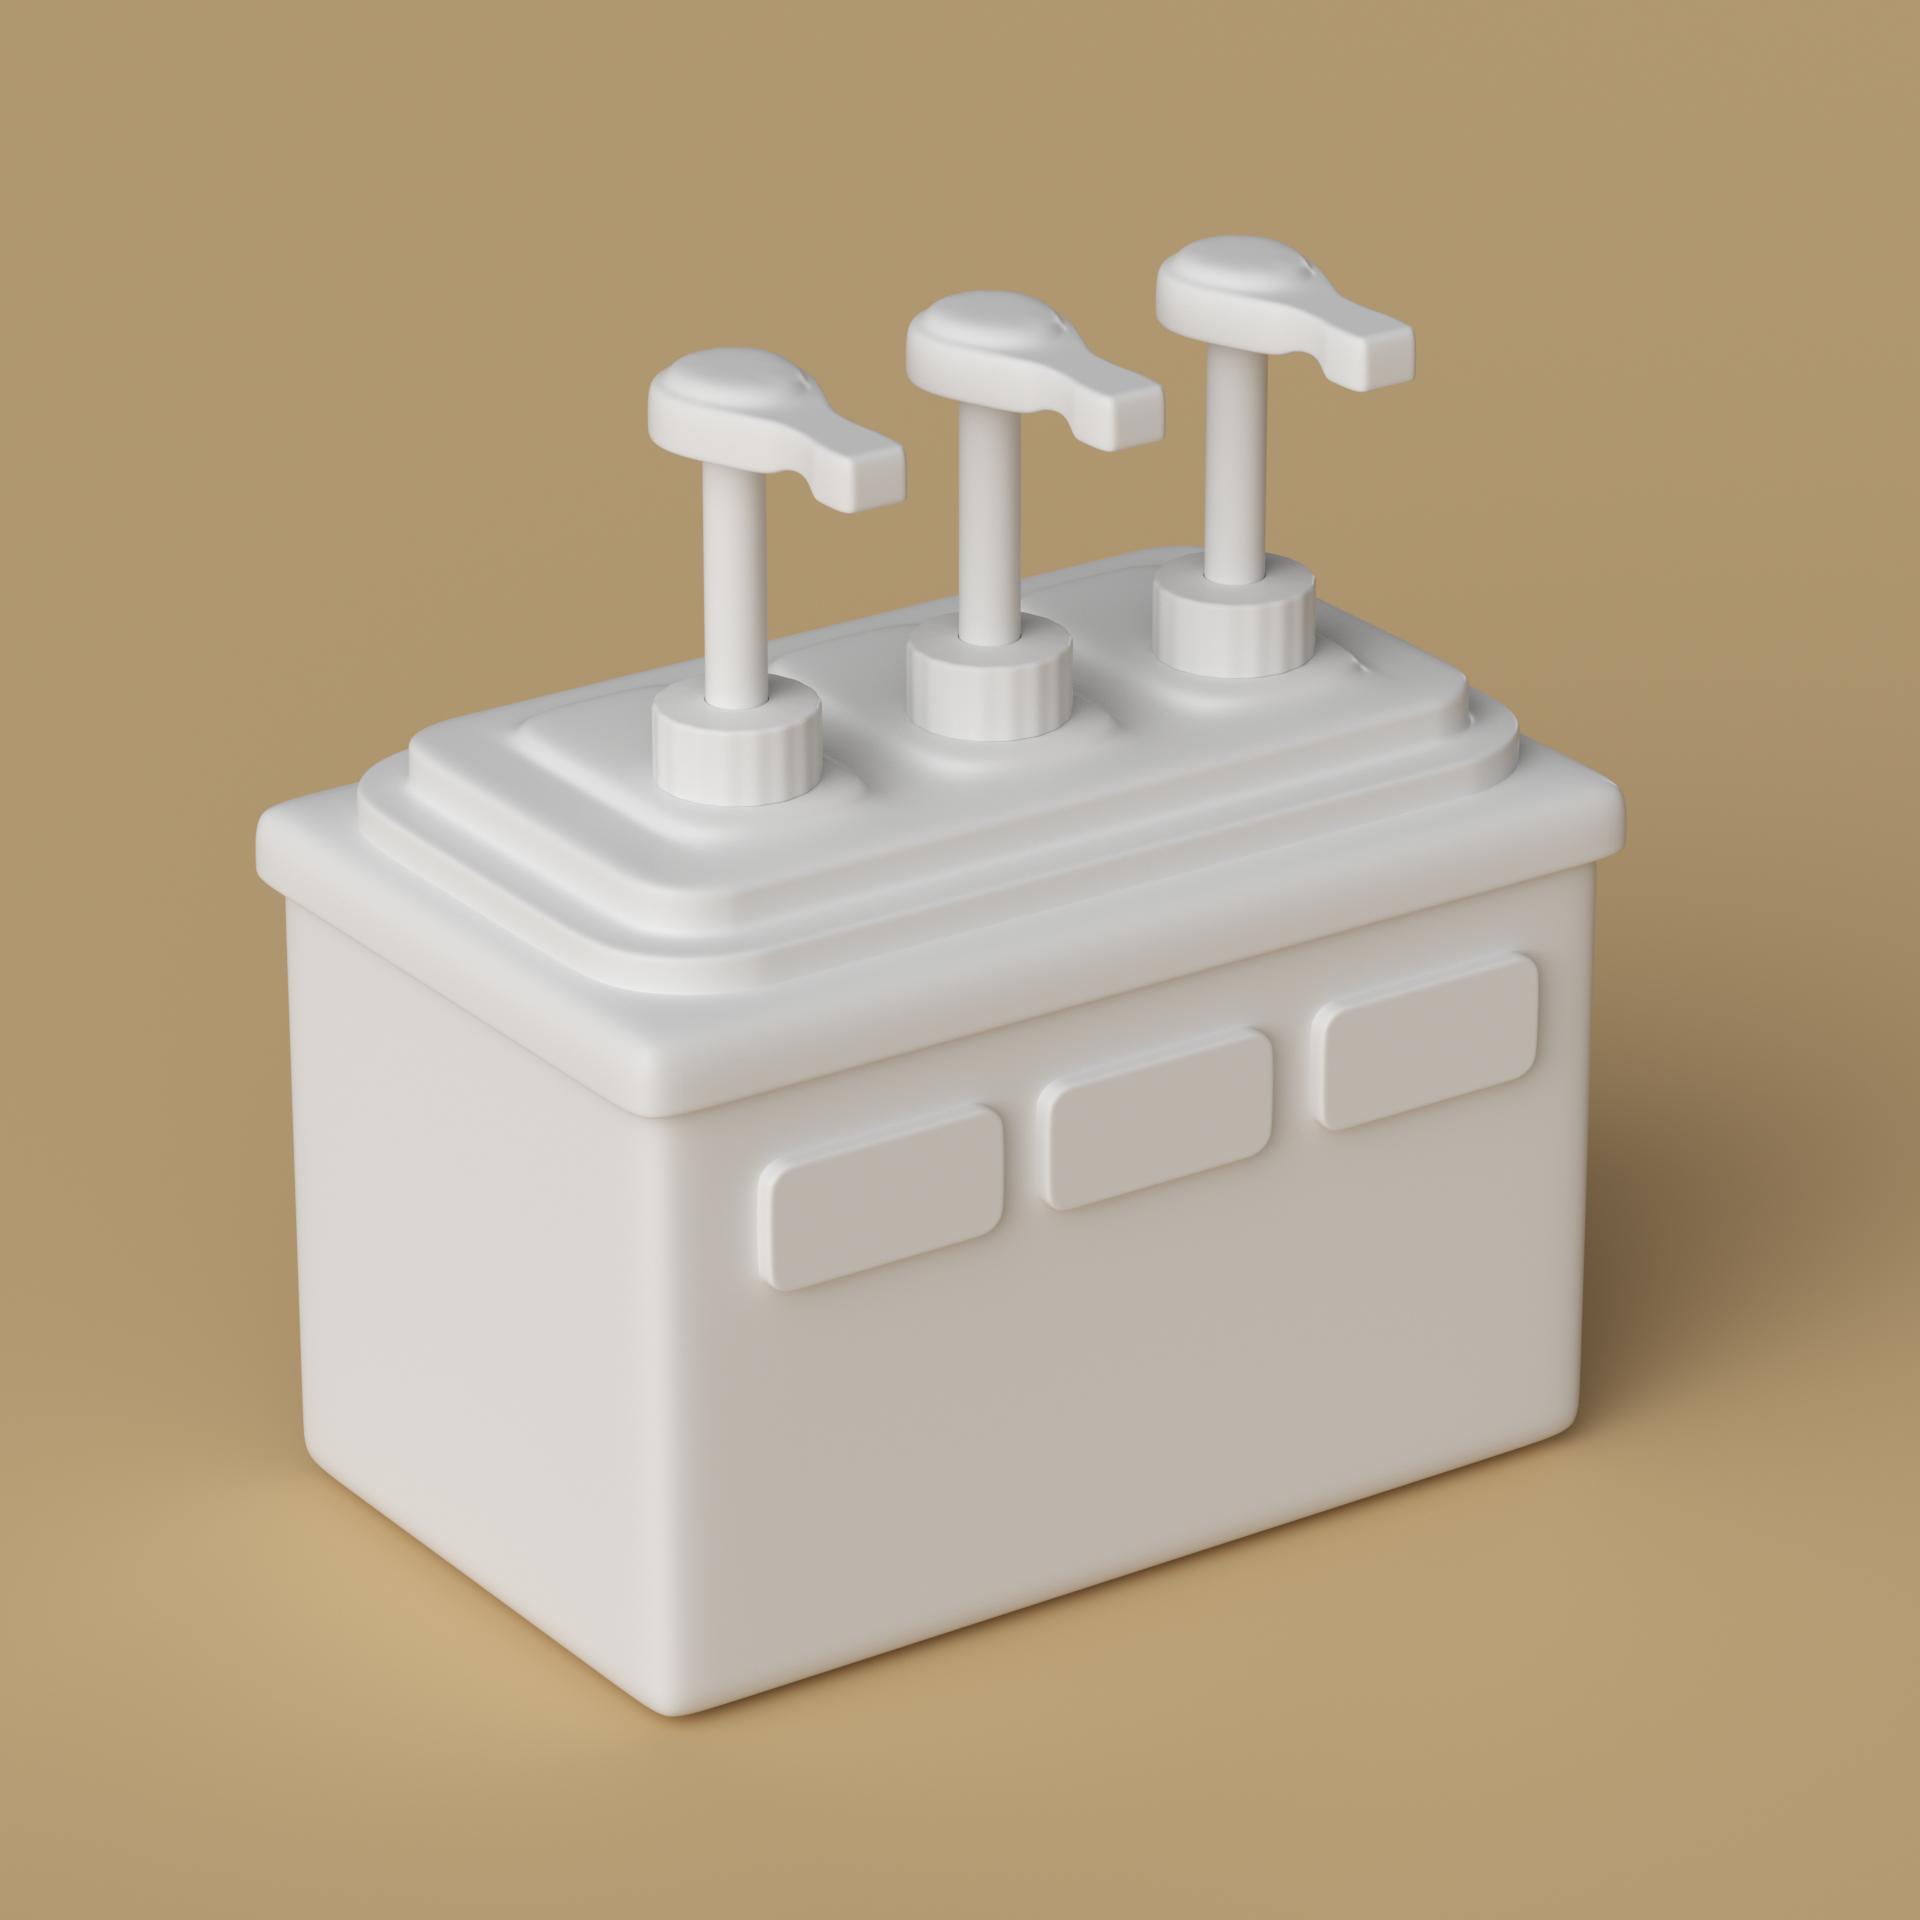 condiment_dispenser.png